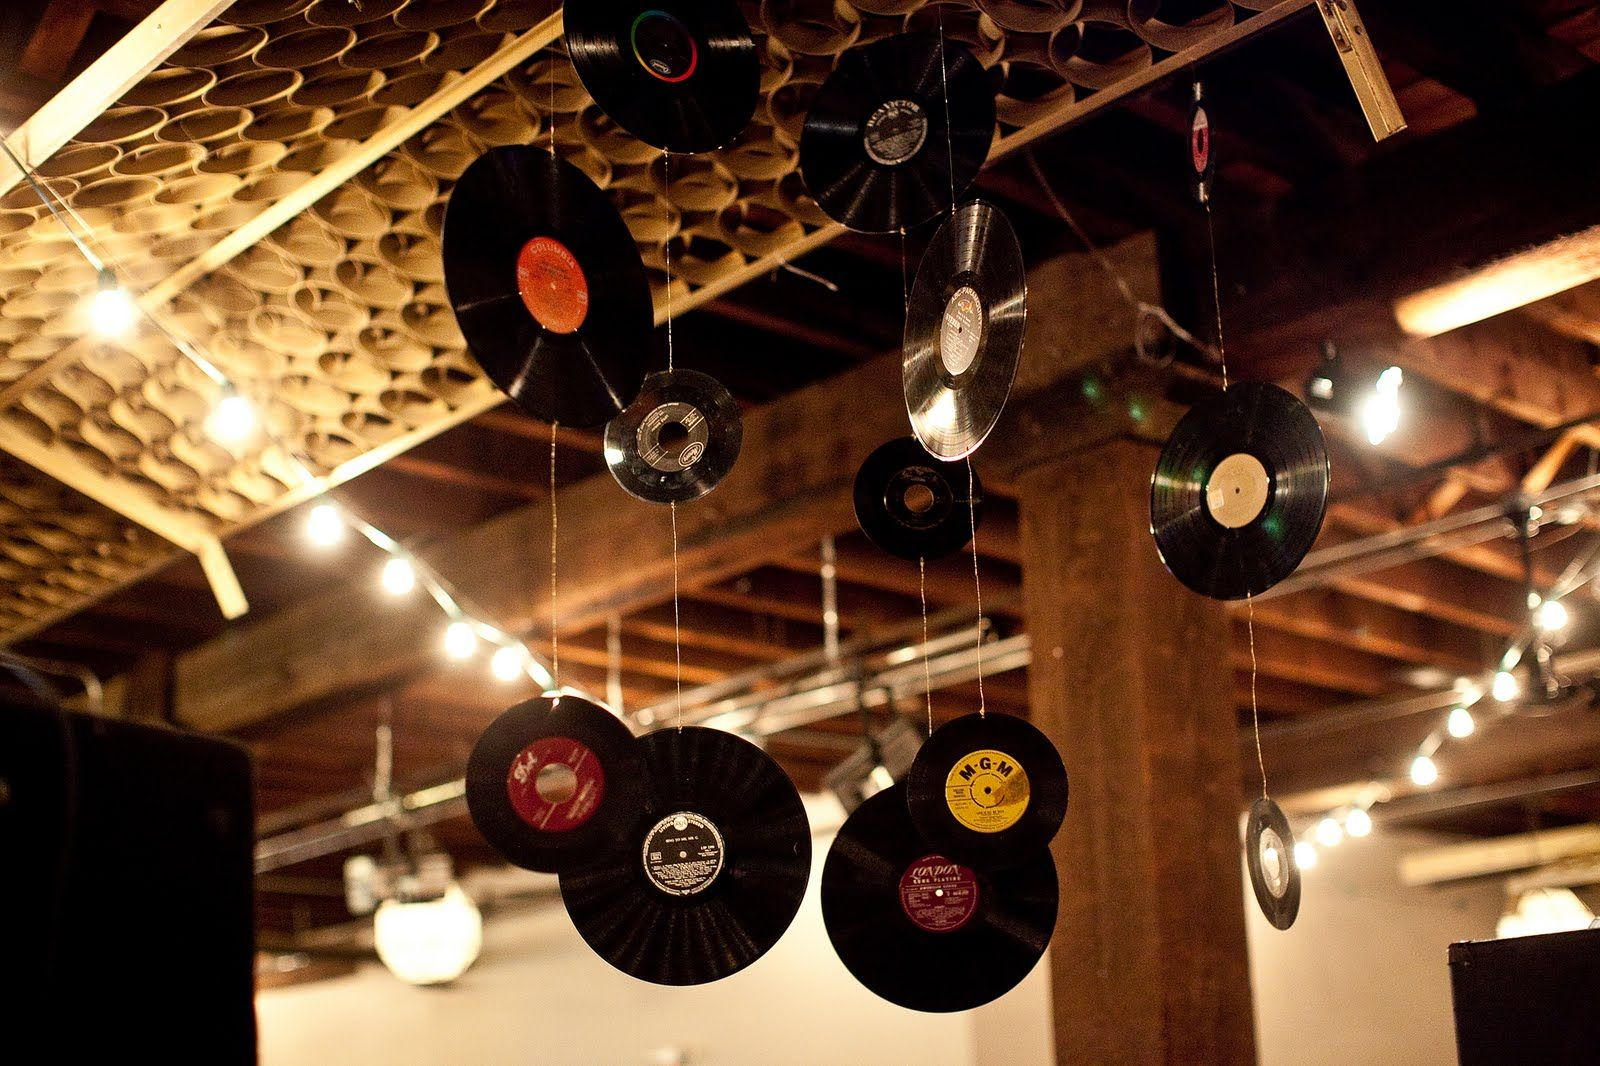 Old Record Ceiling Decorations Julie Banner Event Design